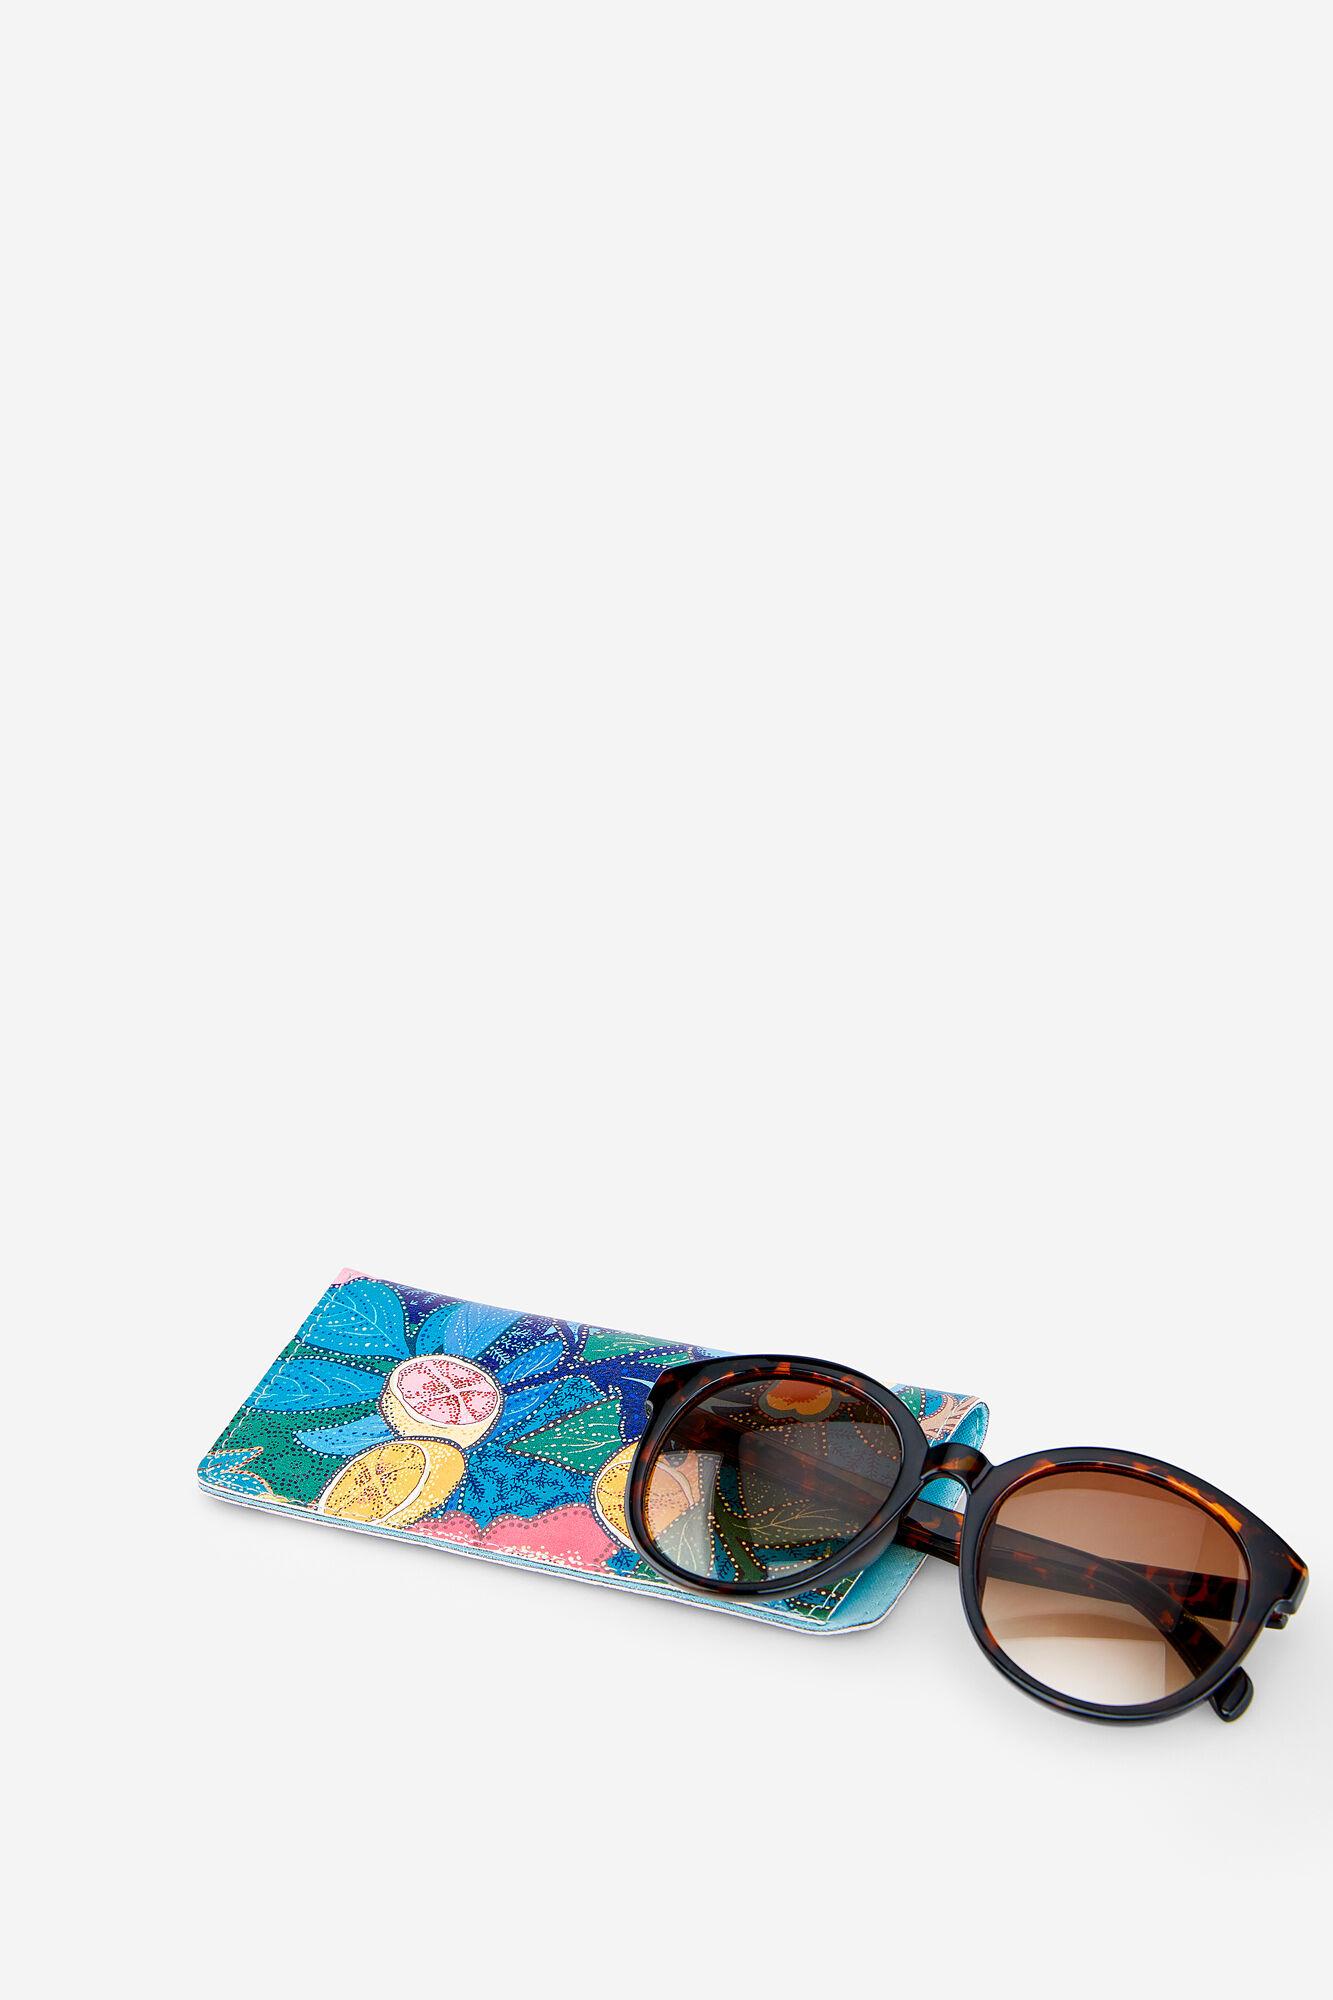 RedondeadasComplementos Gafas Sol Fifty De 4A5jLR